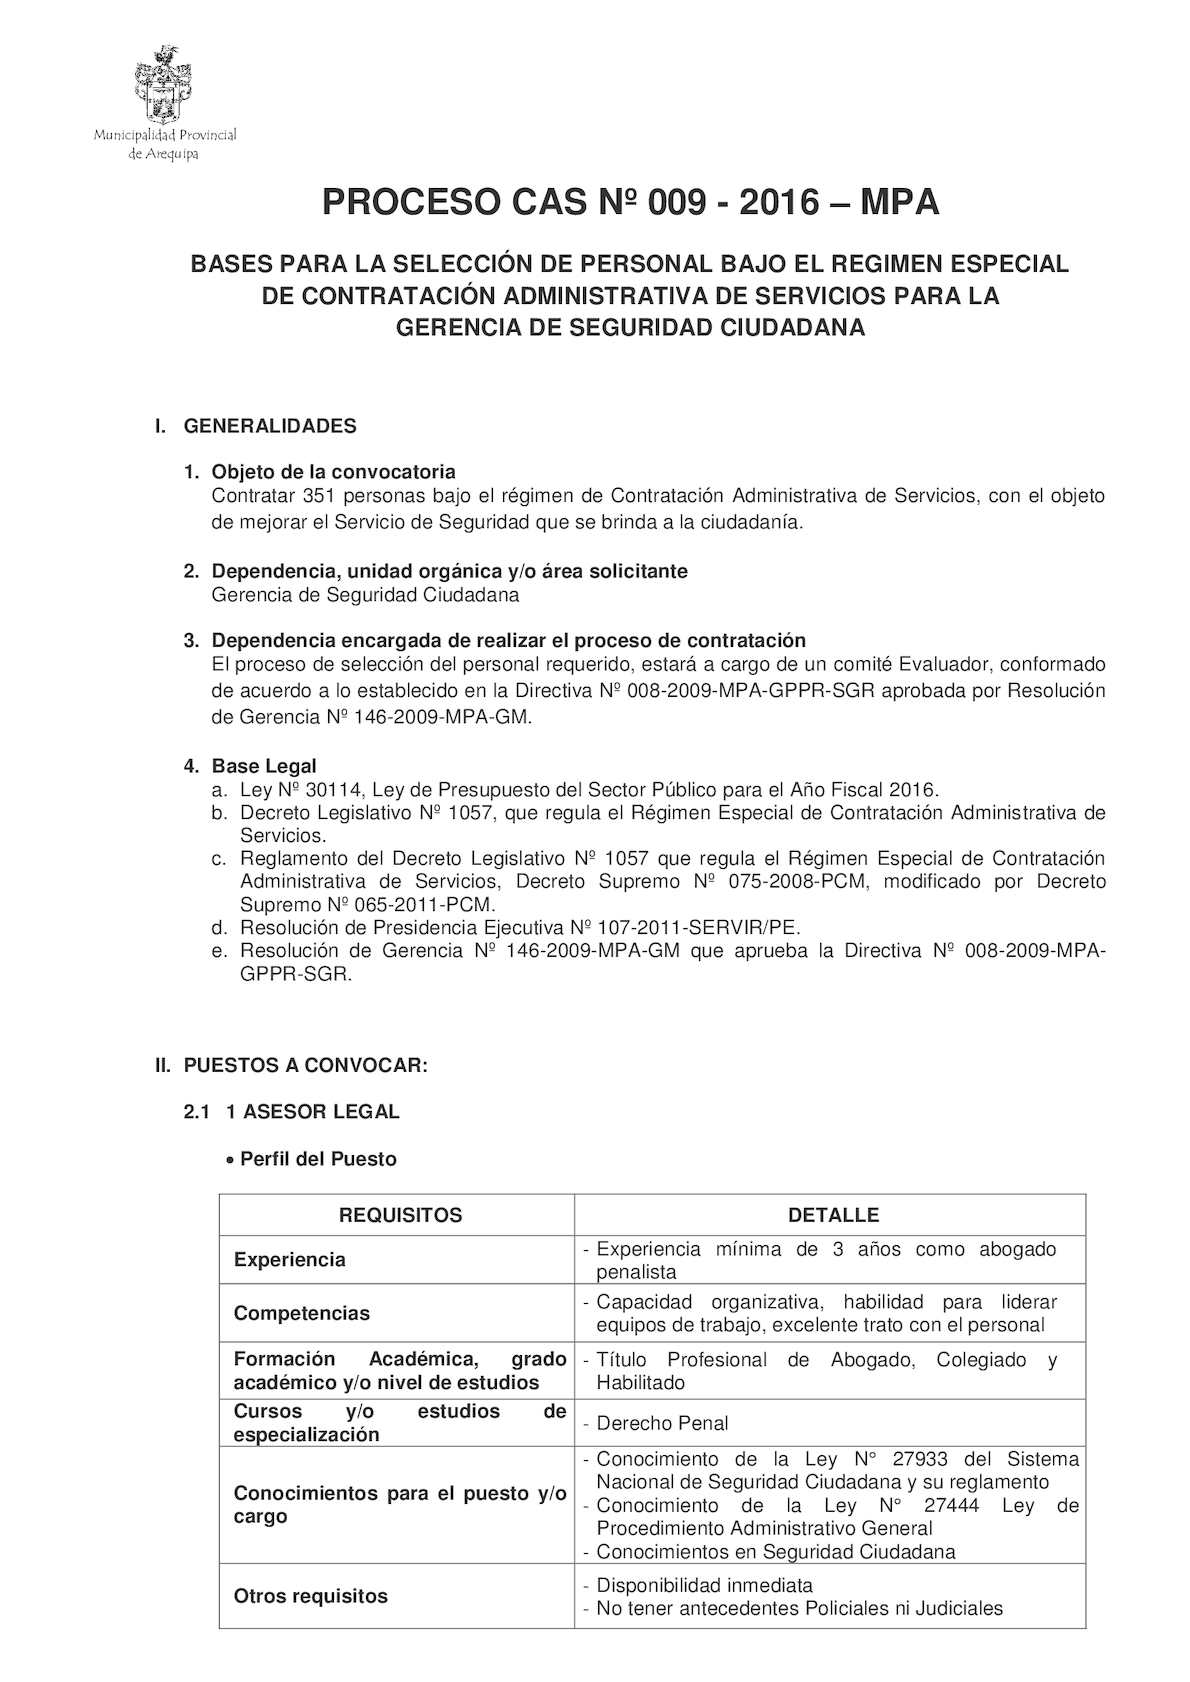 Calaméo - Convocatoria Municipalidad De Arequipa